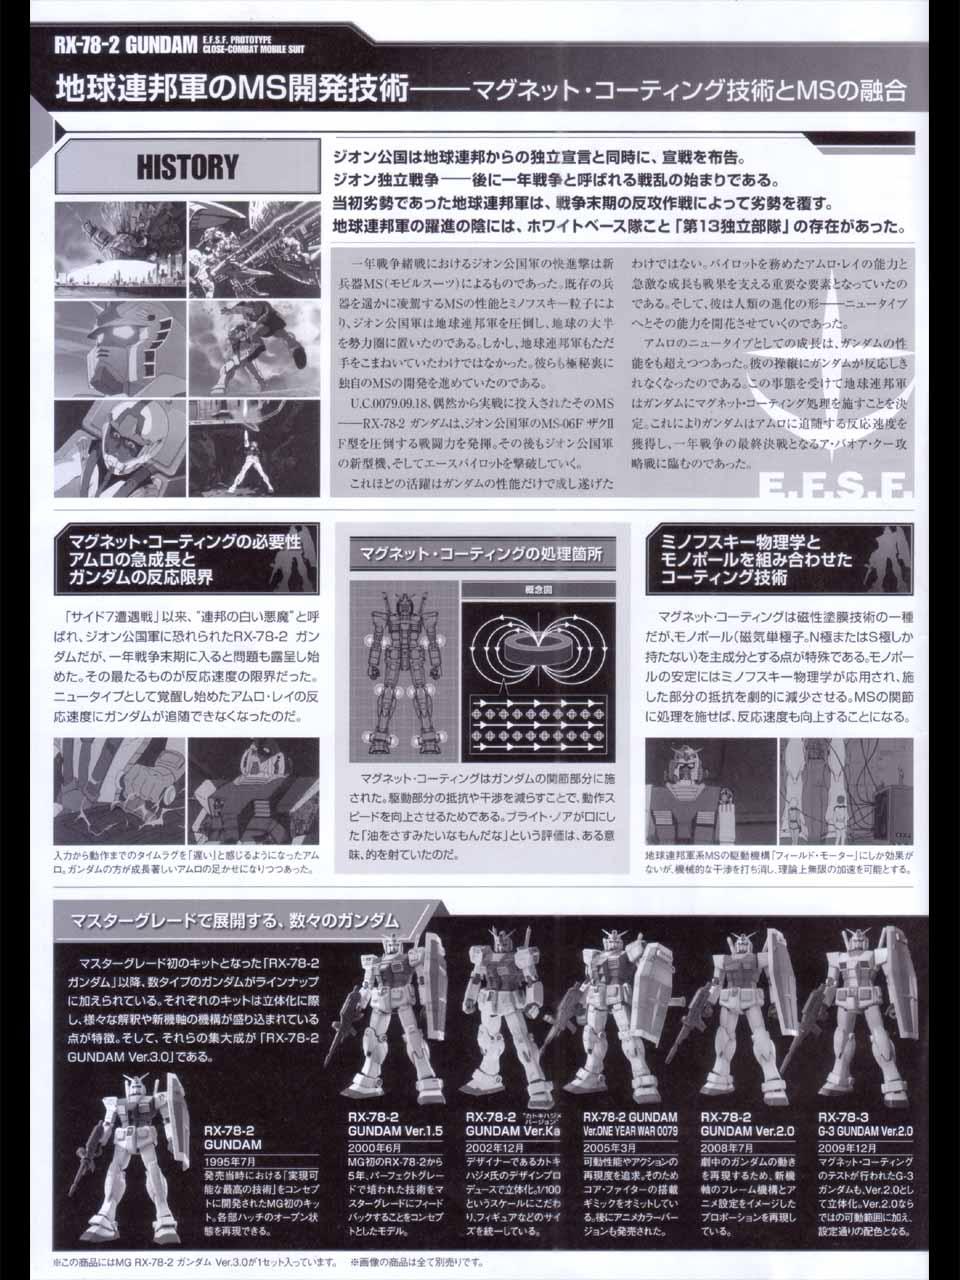 MG_RX78_2_Gundam_Ver3_A08.jpg